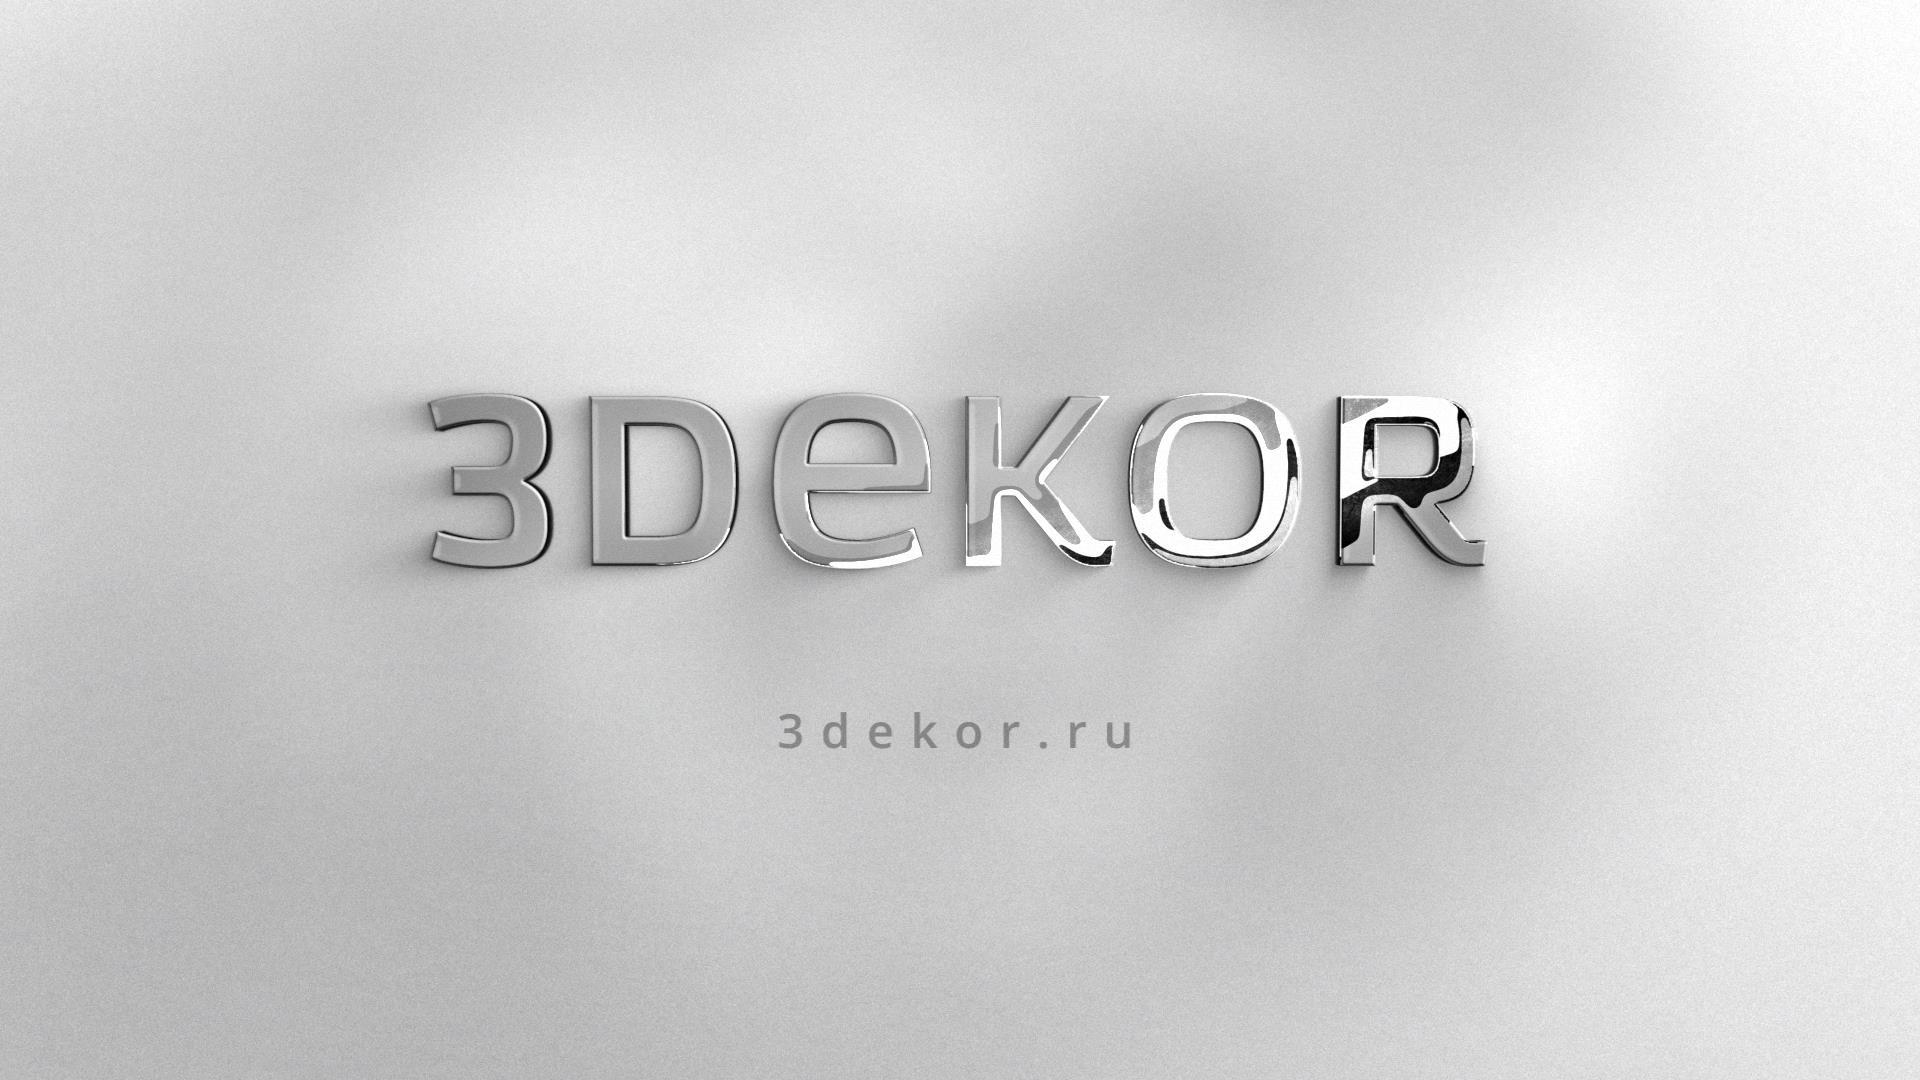 3dekor-3.mov_snapshot_00.03_[2014.11.15_12.19.38]